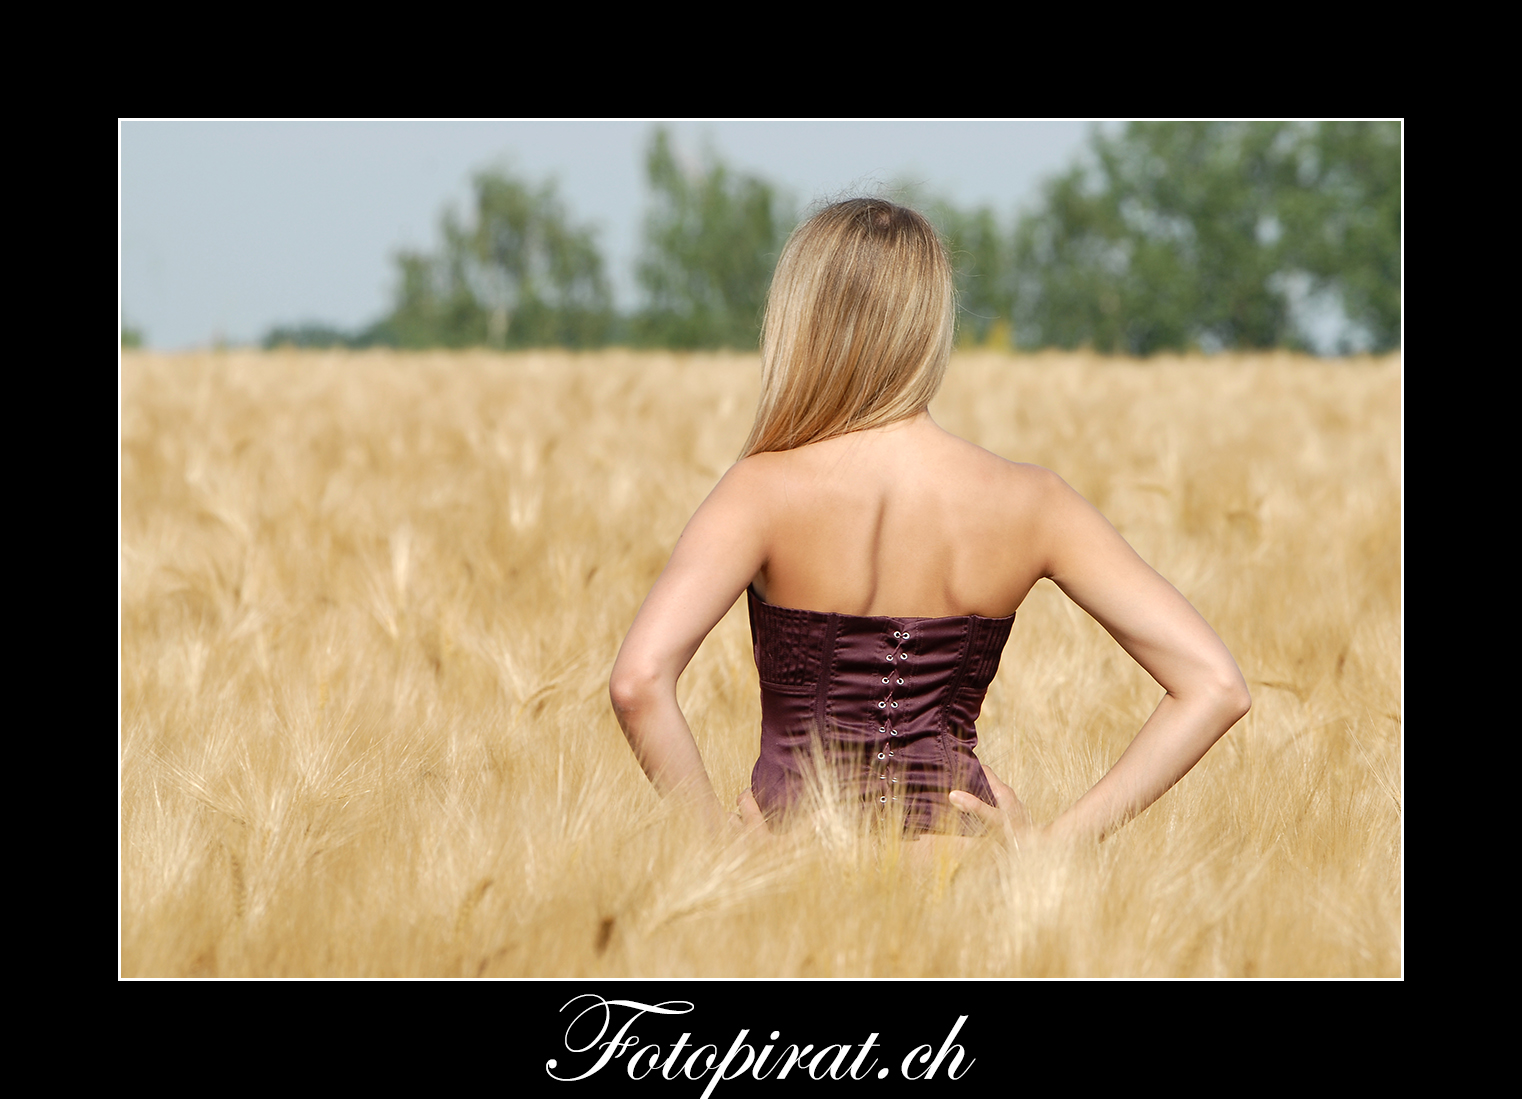 Fotoshooting, outdoor, Modelagentur, sexy Model, Sportmodel, Fitnessmodel, Kornfeld, Korsett